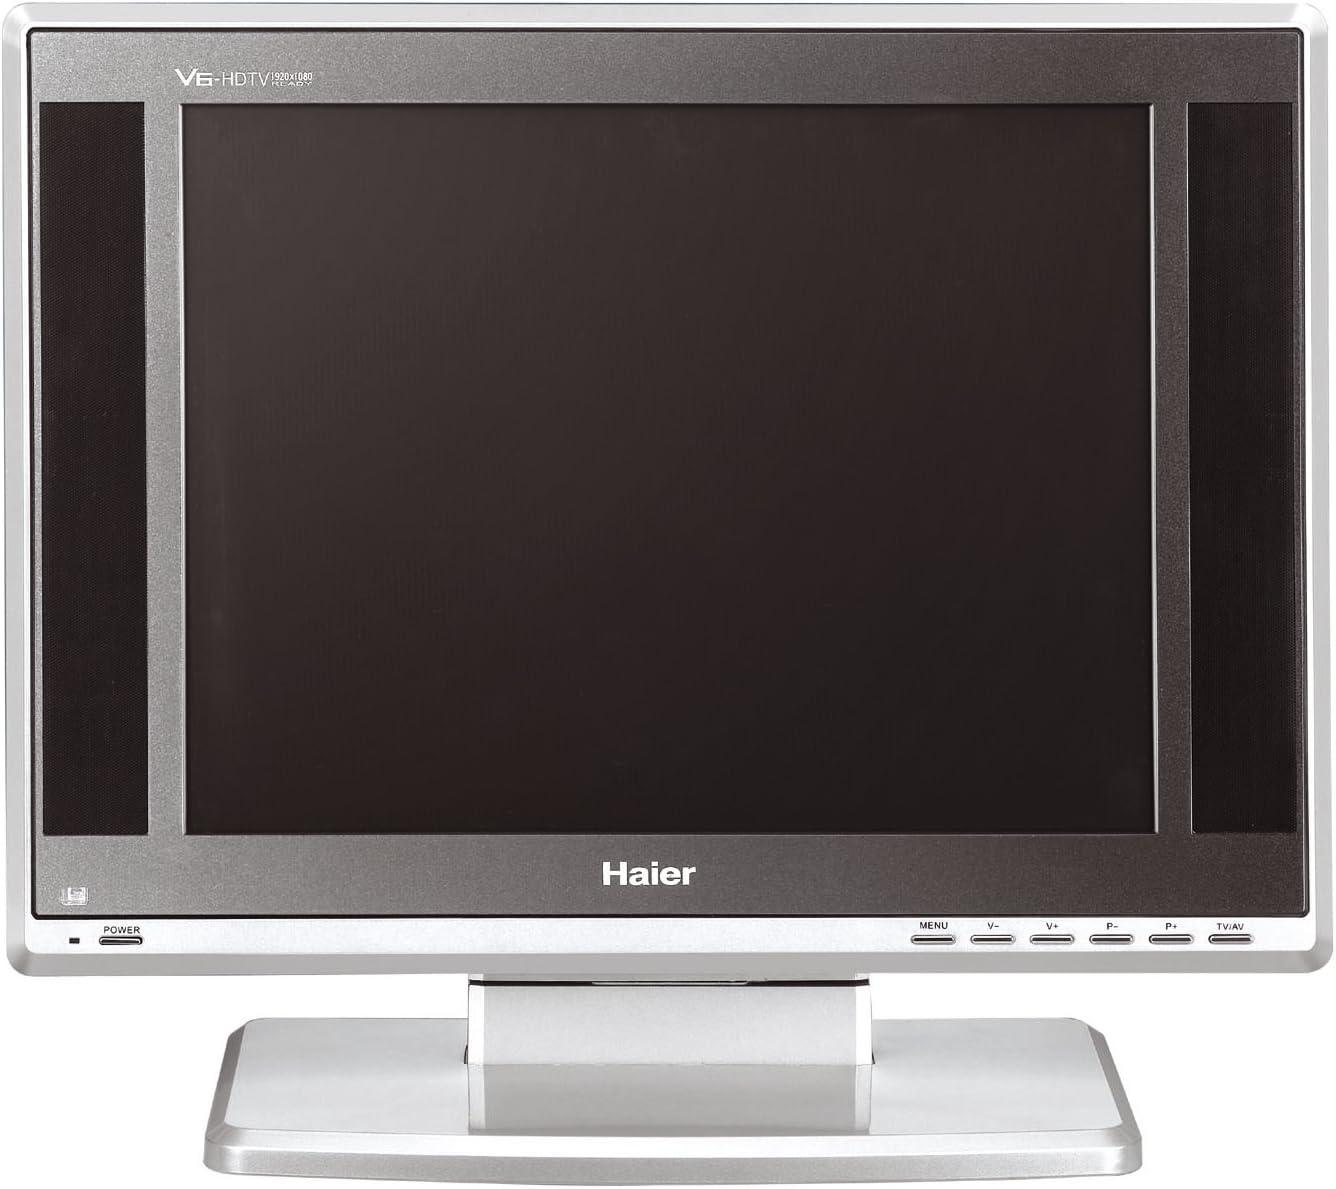 Haier L 20 AV 6 A 0 - Televisión, Pantalla 20 pulgadas: Amazon.es: Electrónica